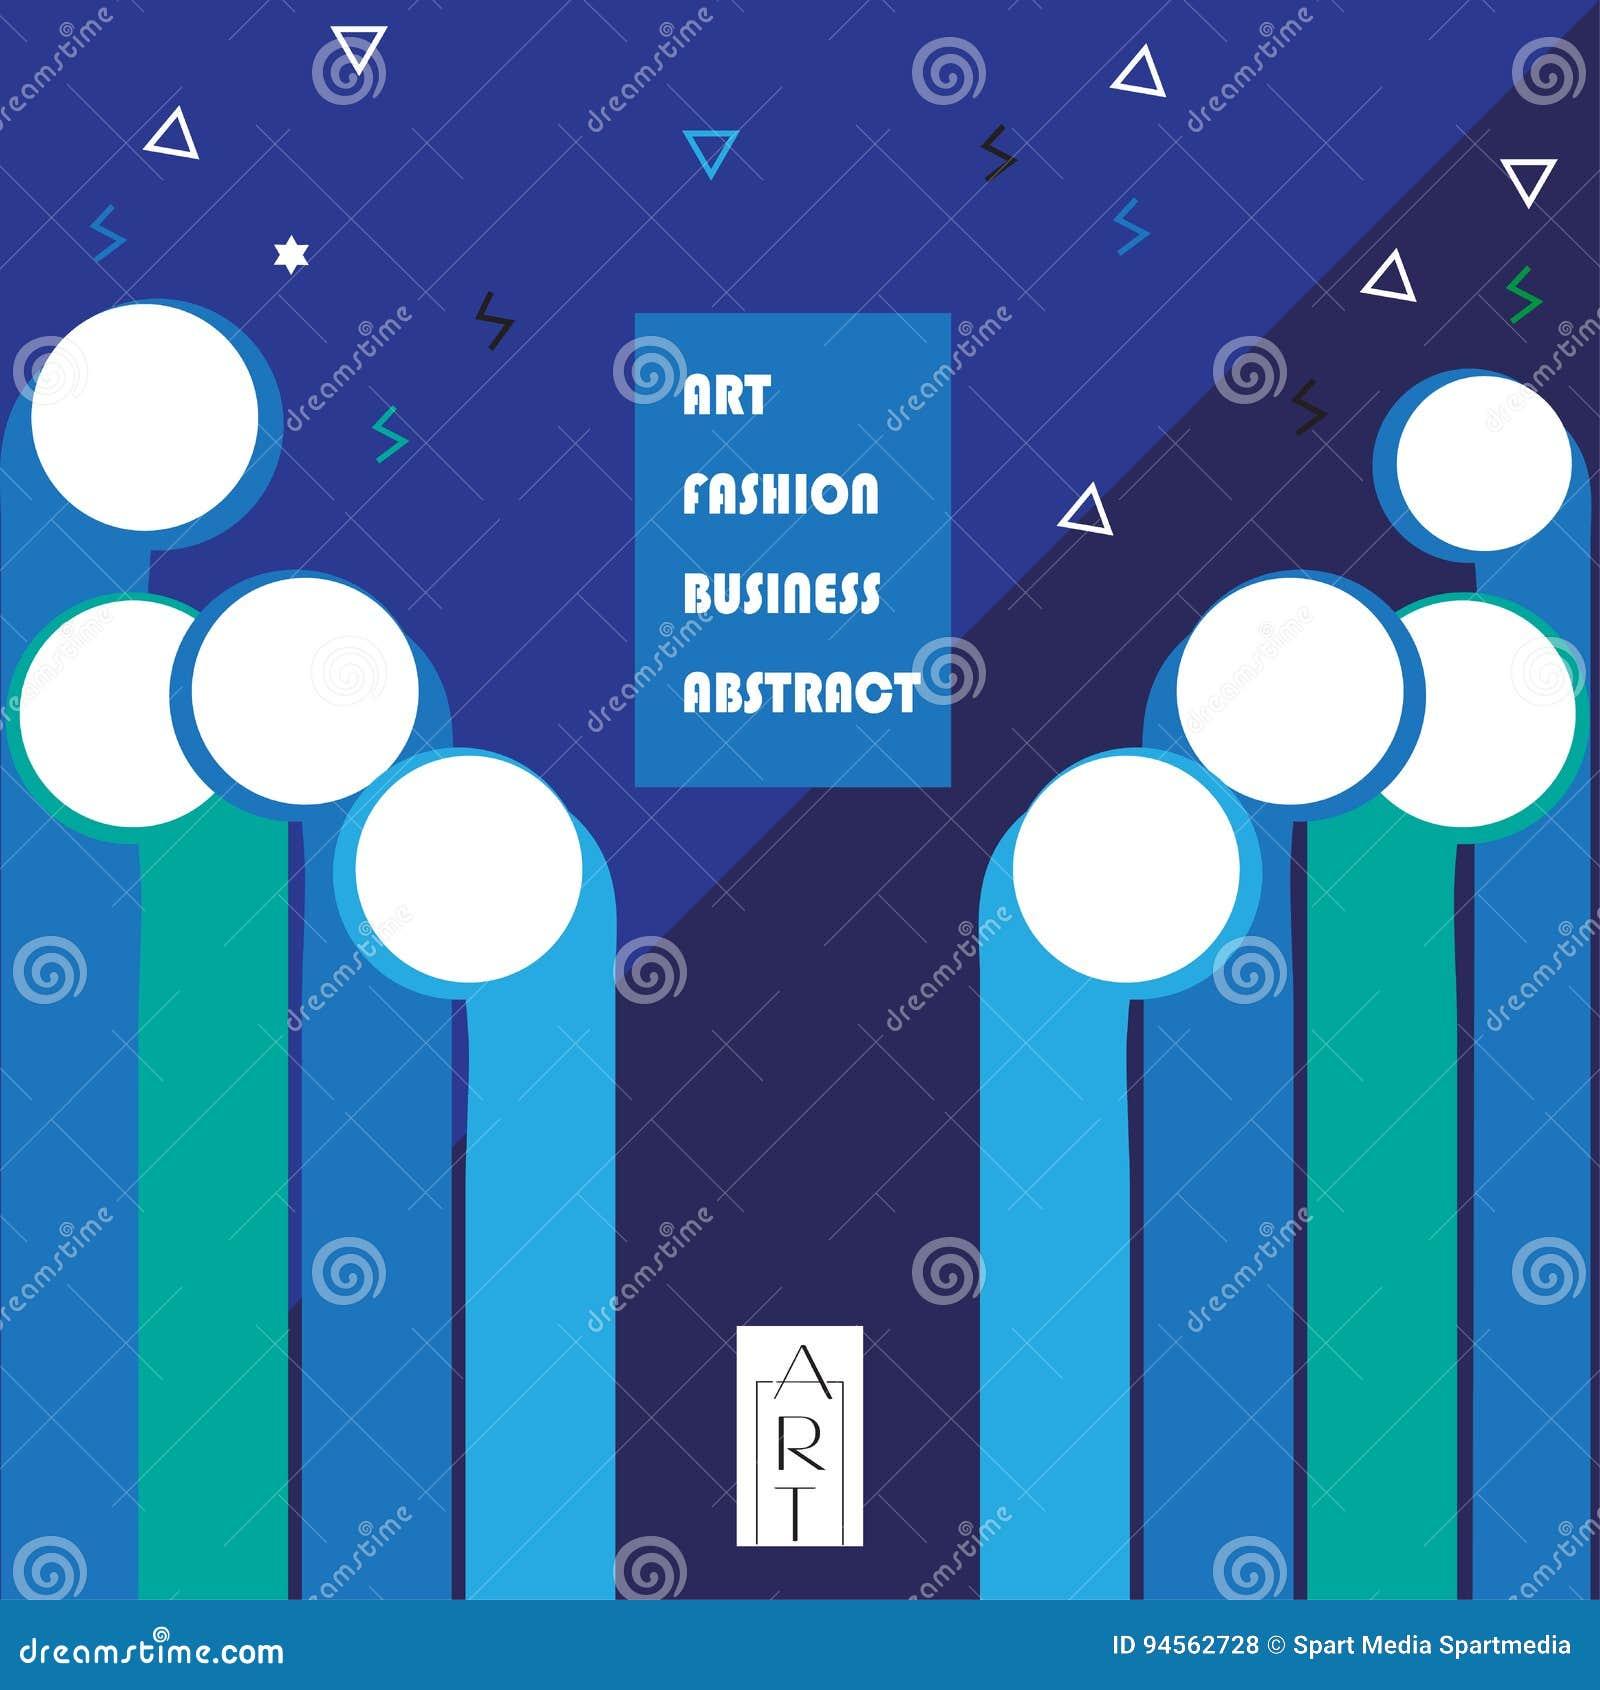 Modern Art Exhibition Poster Stock Vector Illustration Of Future